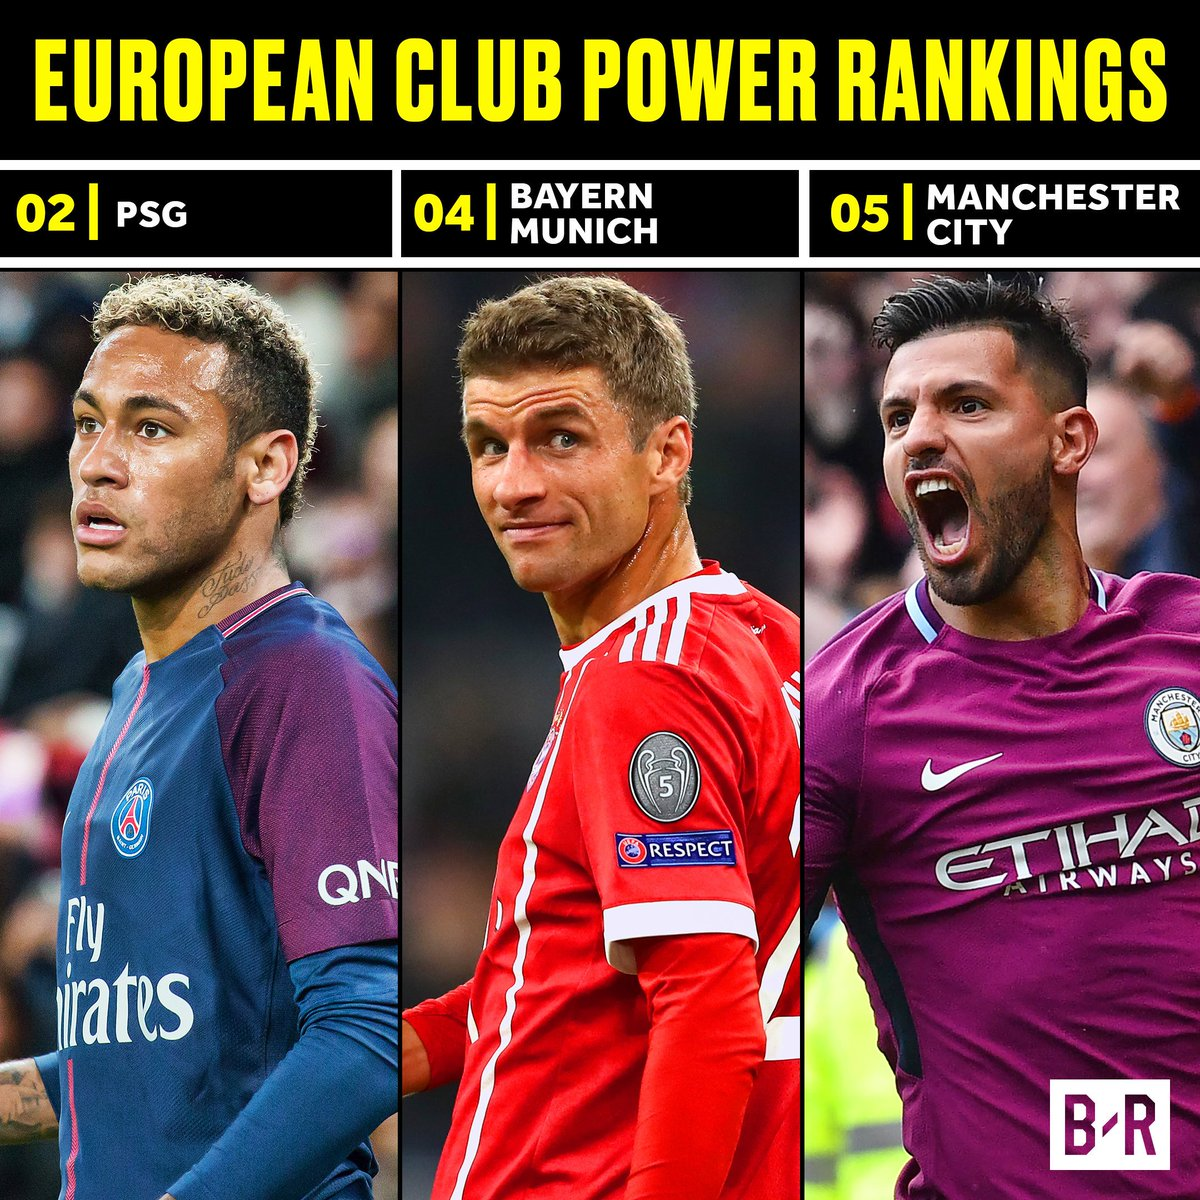 Barcelona > Real Madrid?  European club power rankings 👉